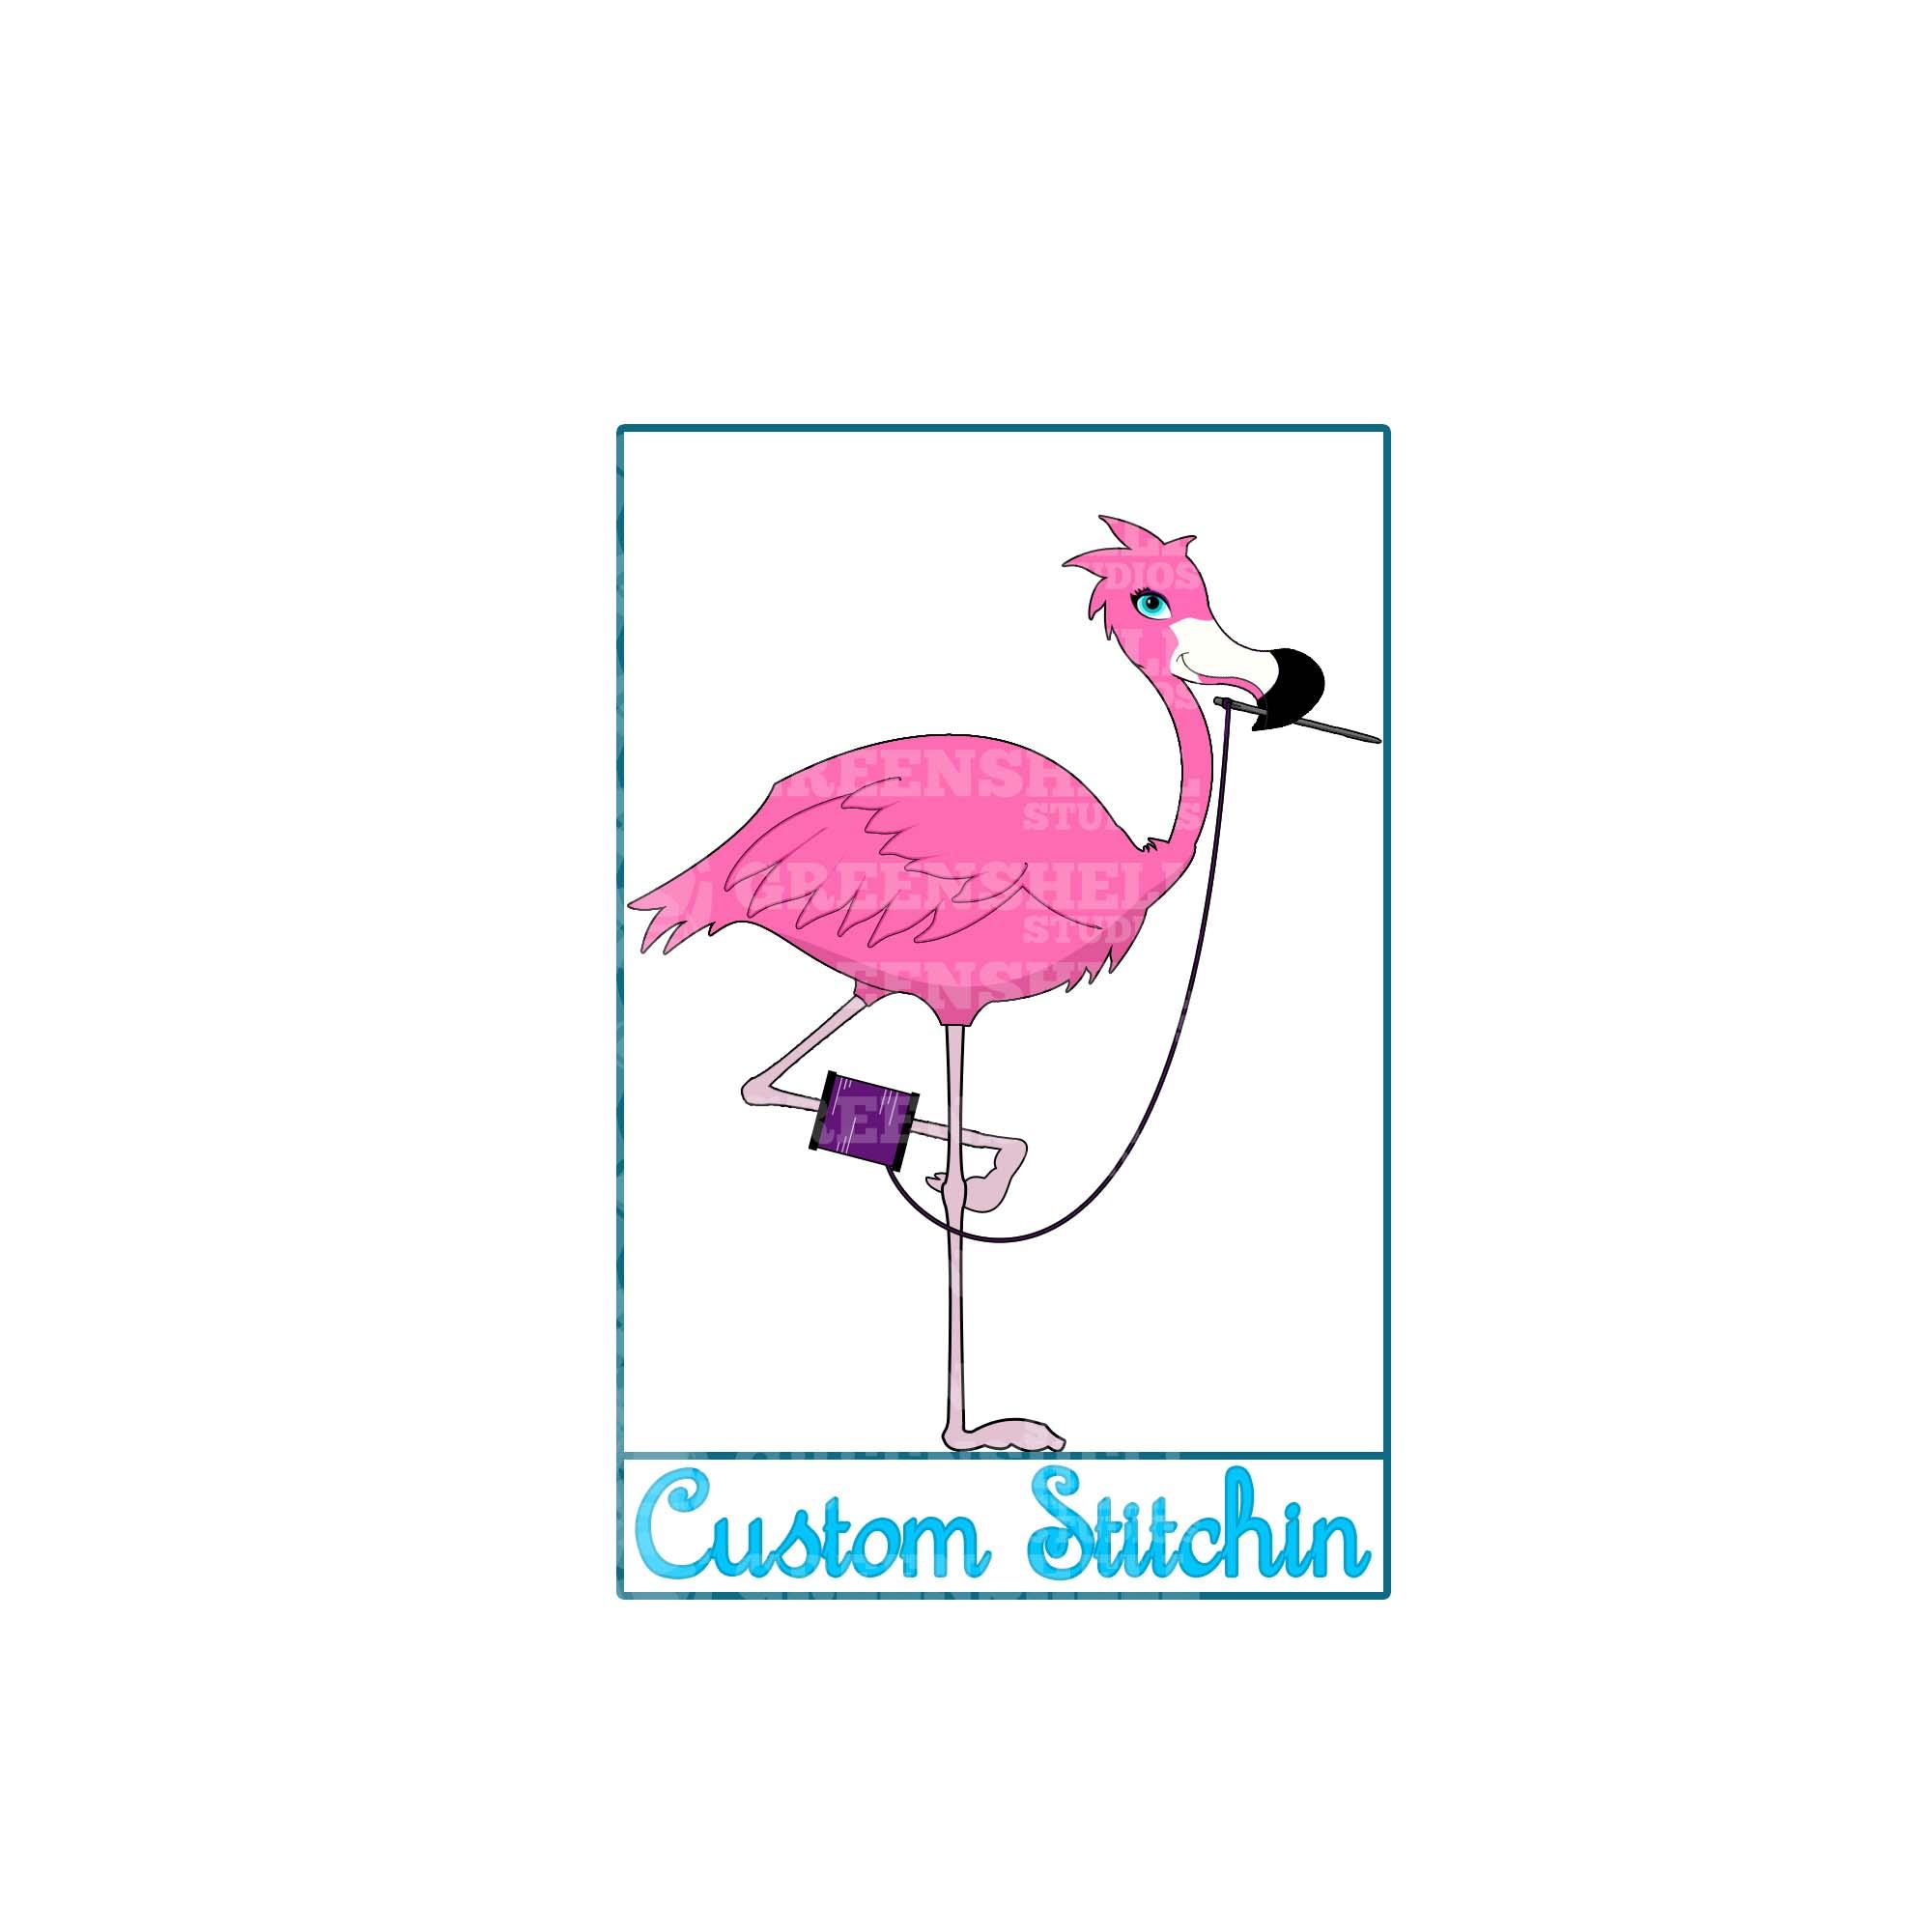 Custom Stitchin'